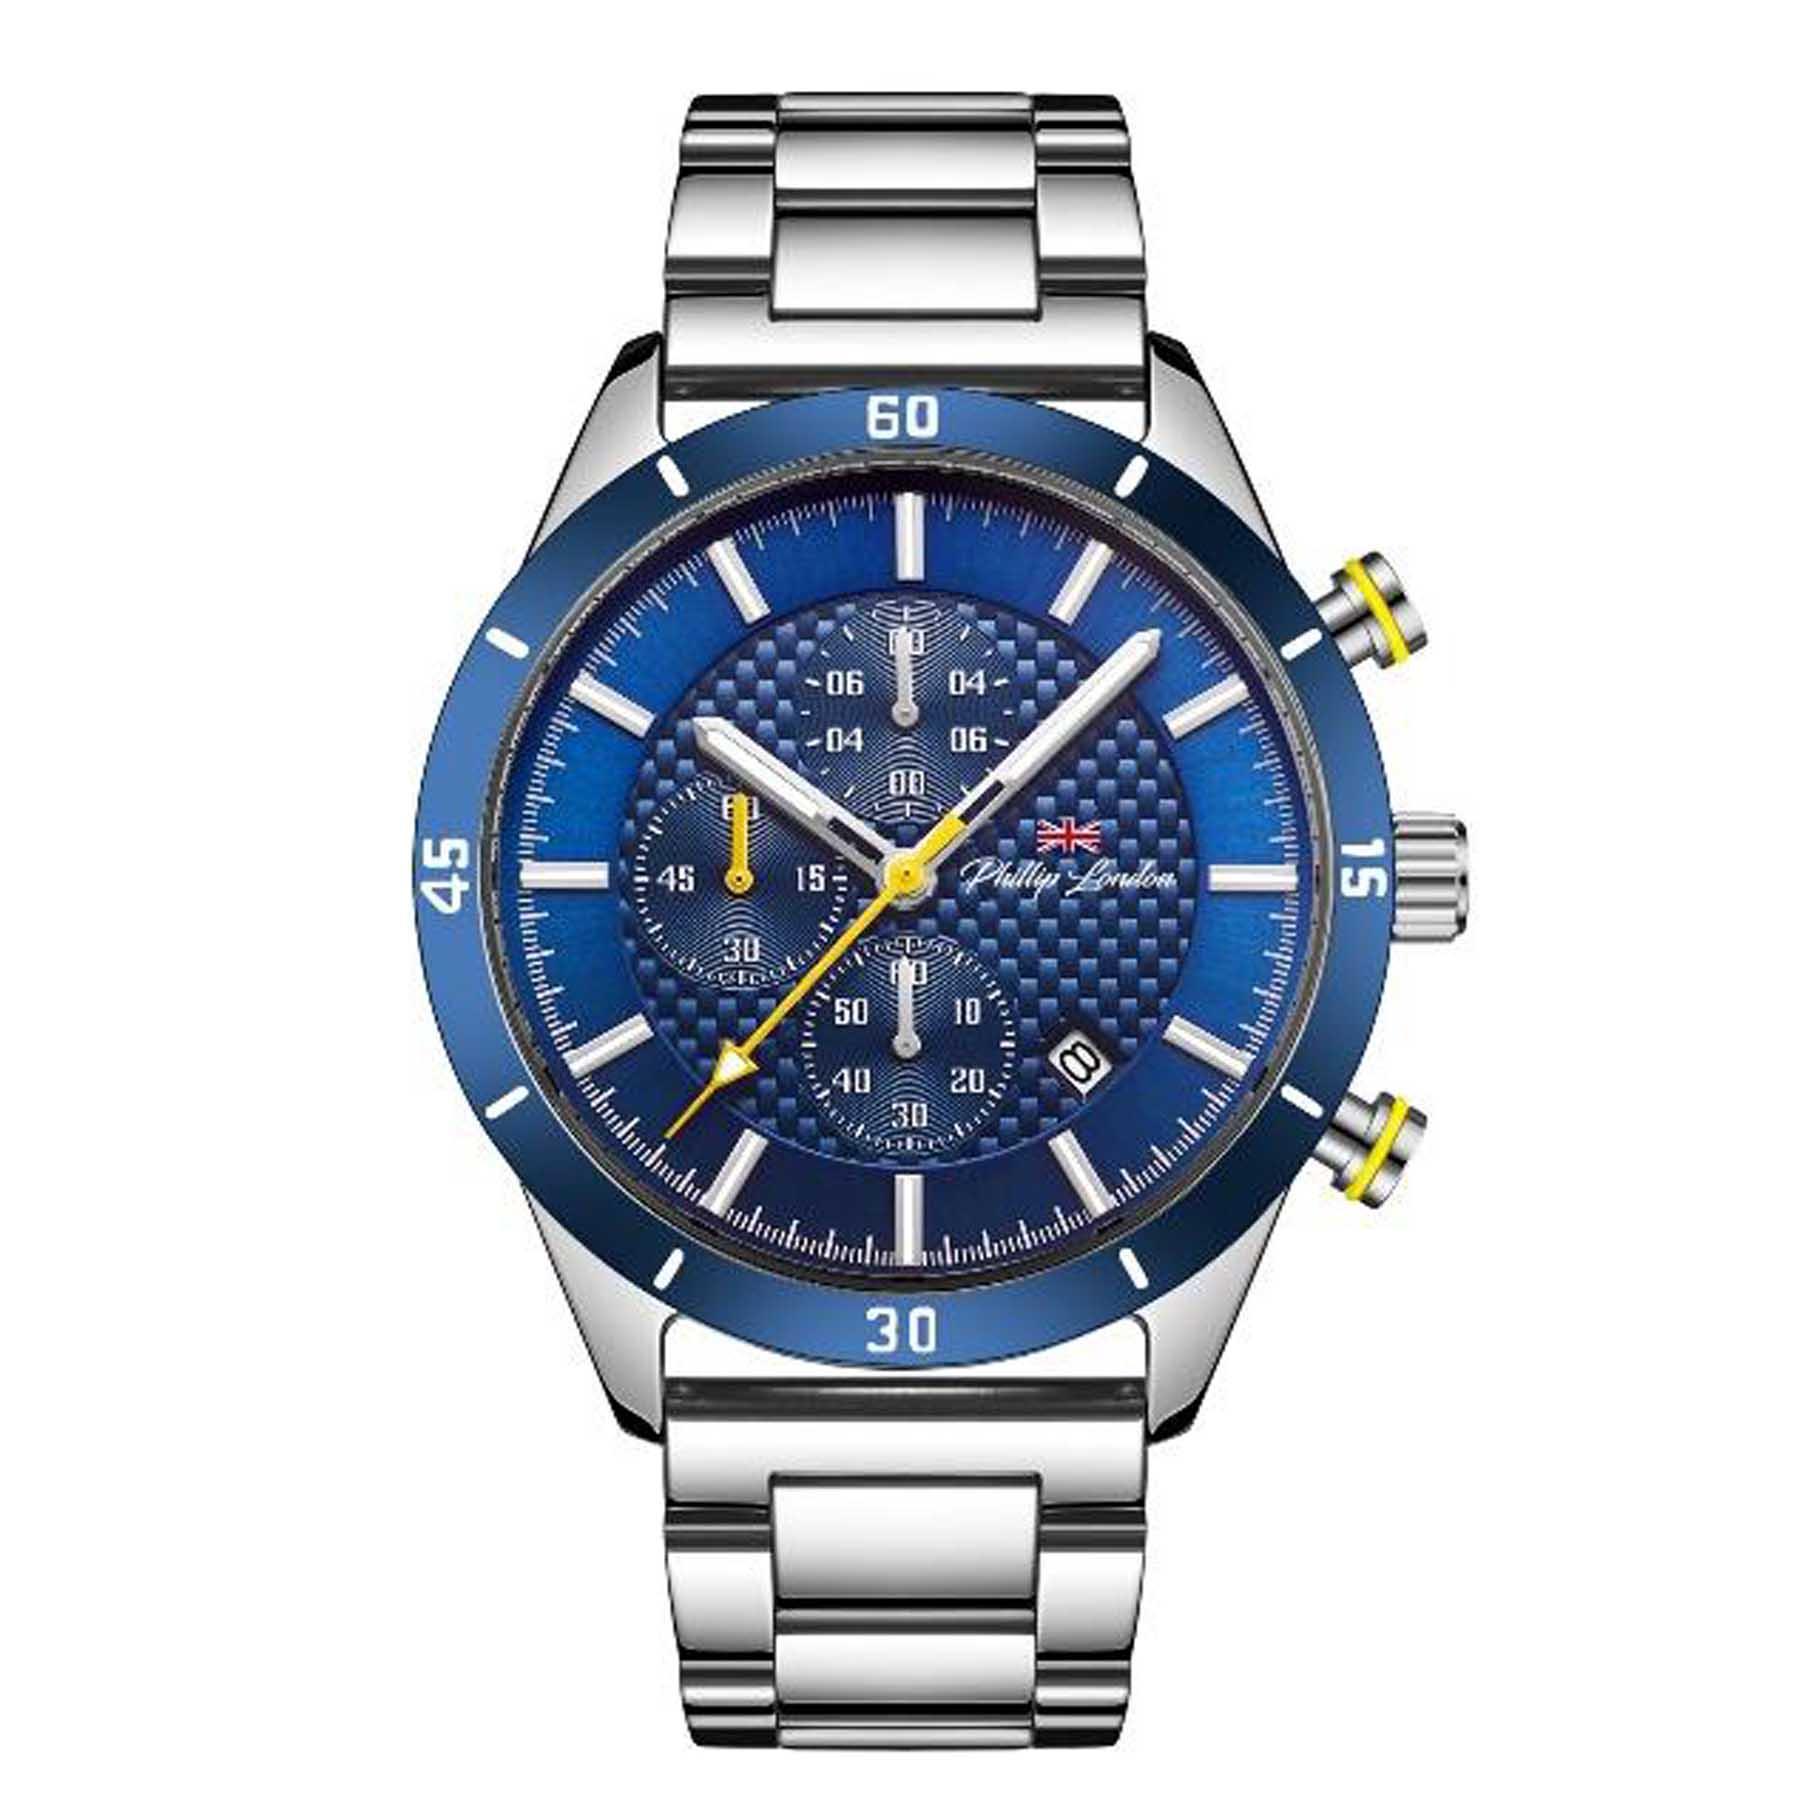 Relógio Philiph London Analógico Masculino PL80207623M